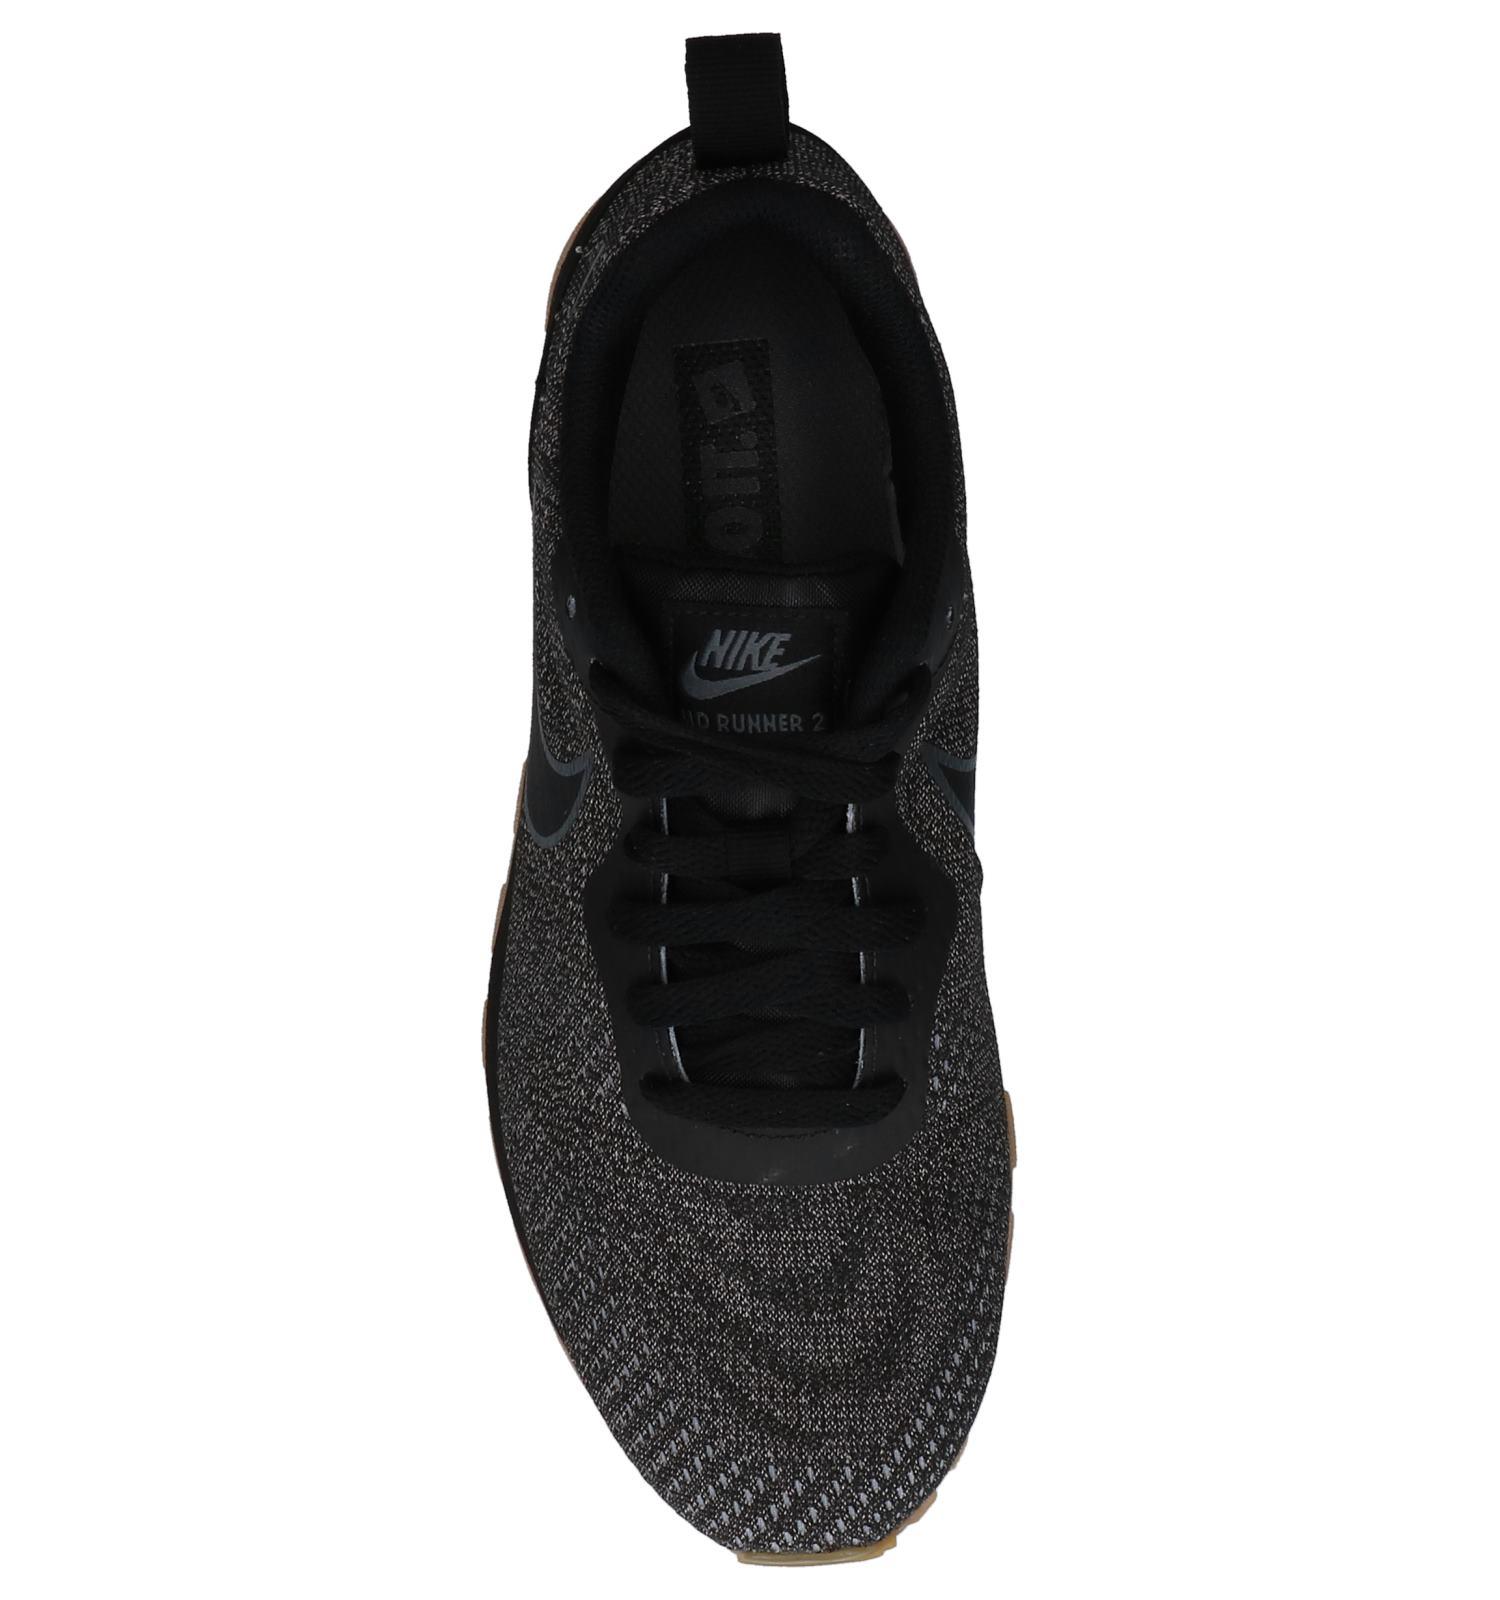 2 Eng Mesh Nike Runner Zwarte Md Sneakers 5RL3j4Aq